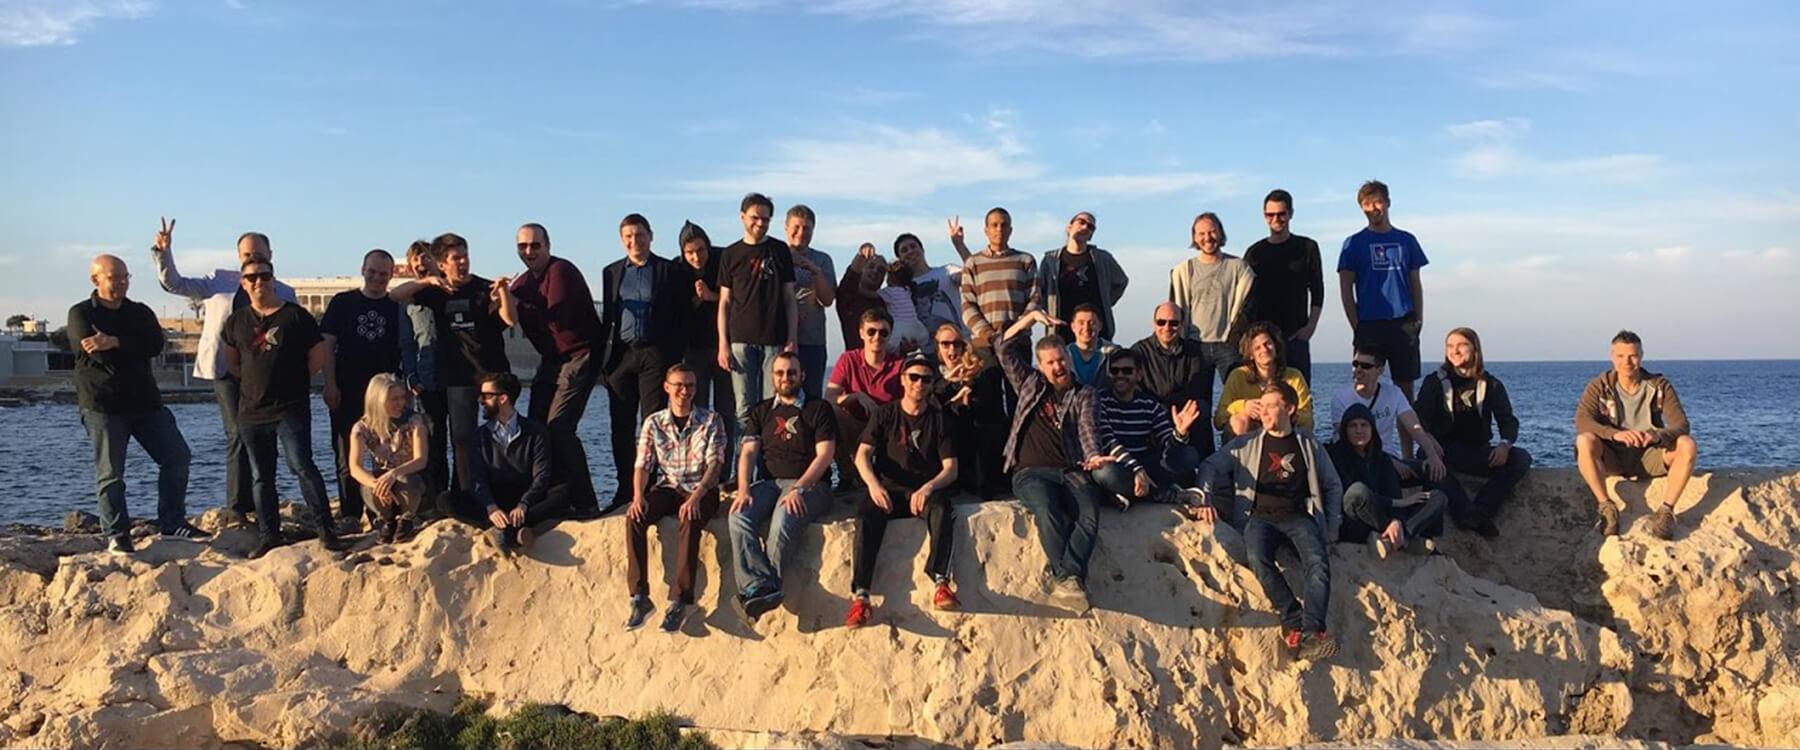 IOHK Team in Malta